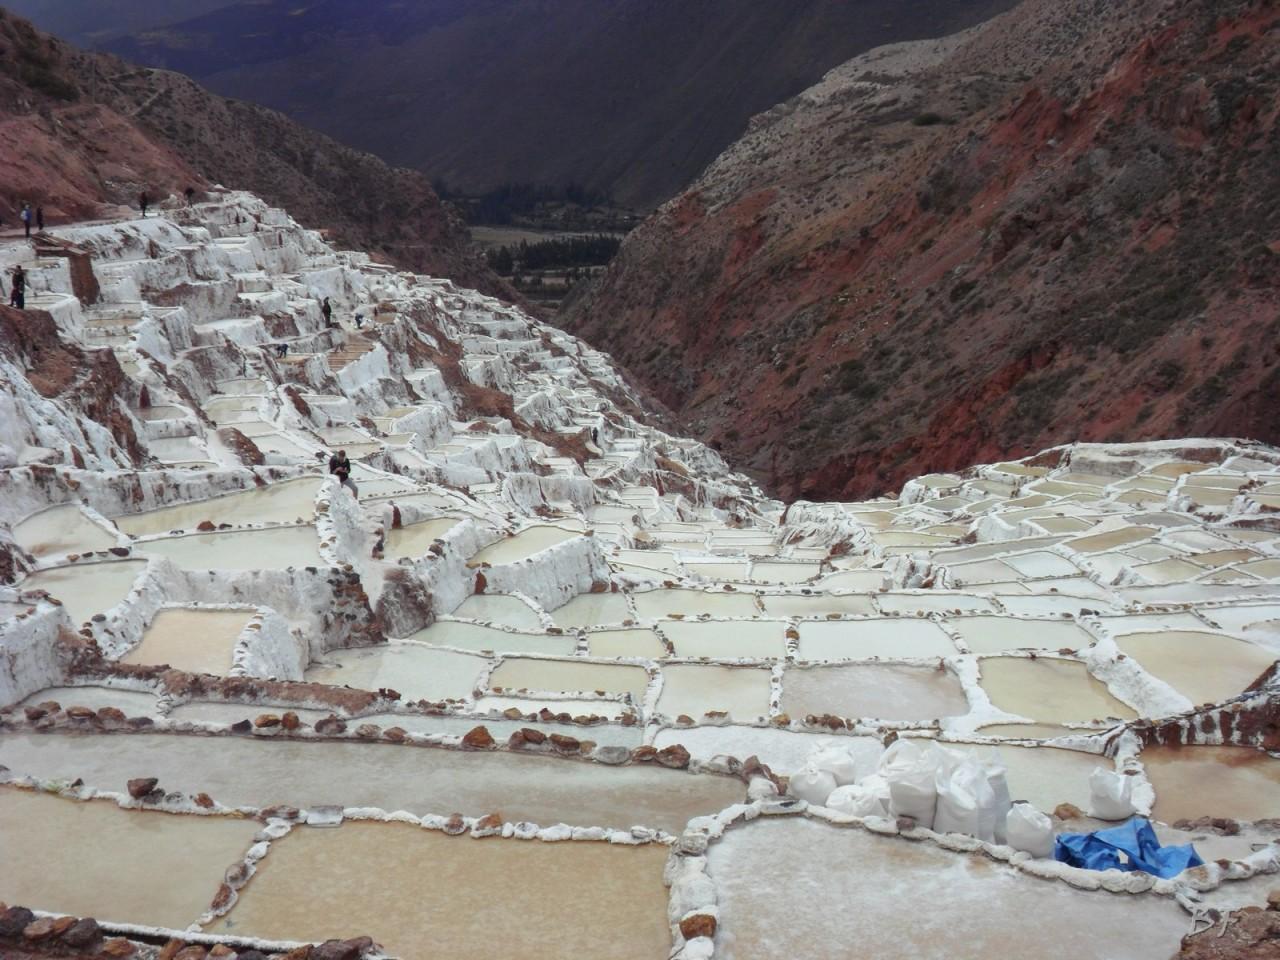 Terrazze-Circolari-Megaliti-Moray-Saline-Maras-Cusco-Perù-15